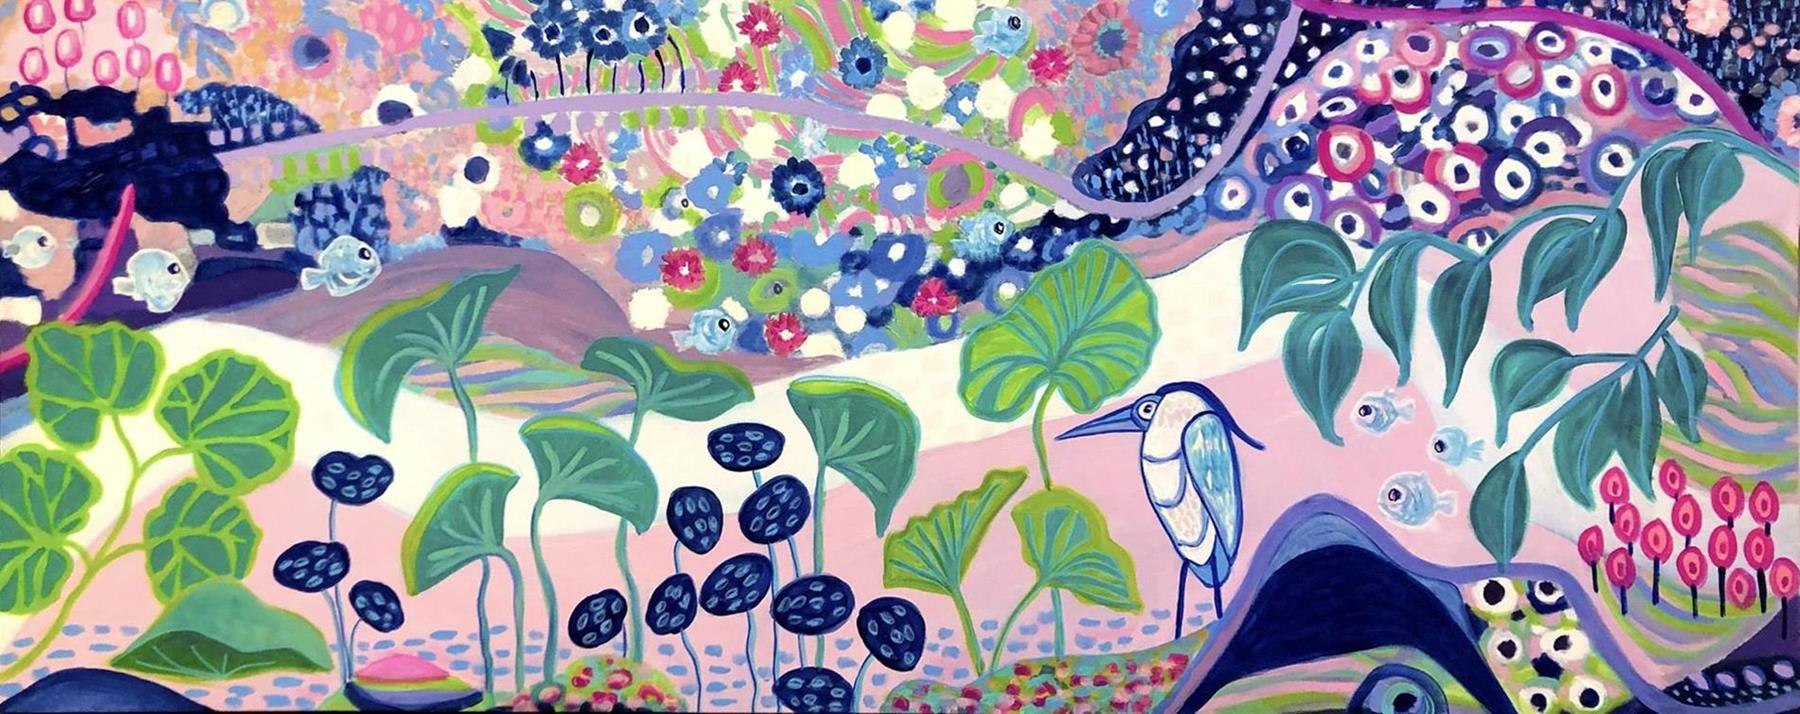 Abstract Wonderland